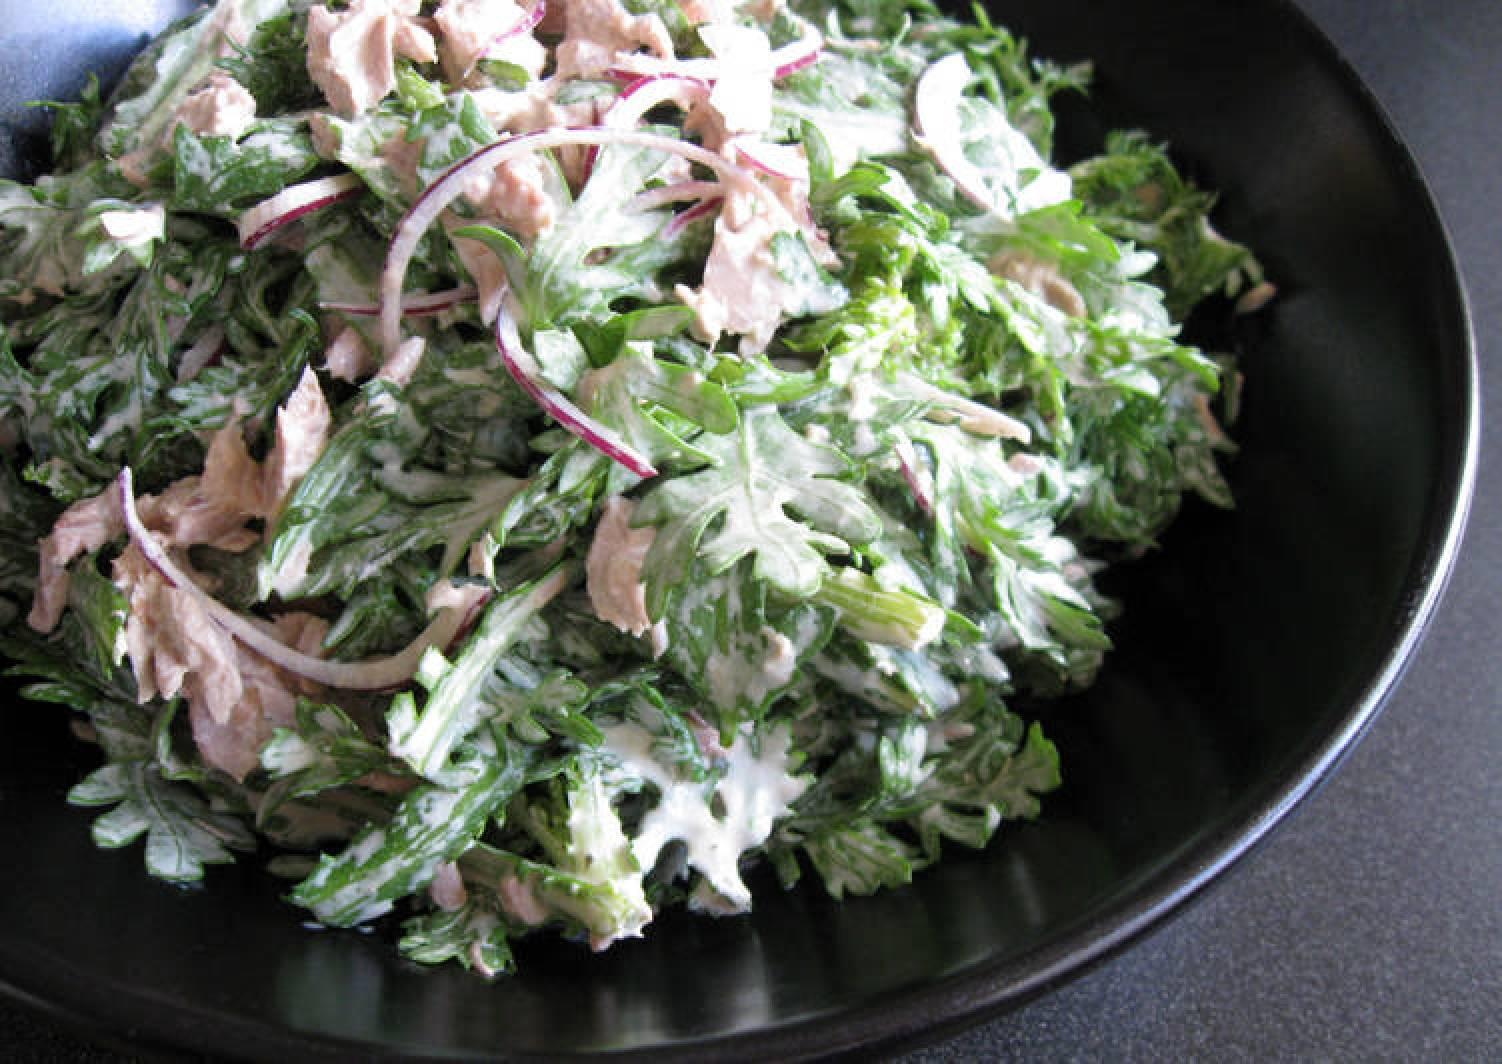 Shungiku (Edible Chrysanthemum) & Tuna Mayo Salad